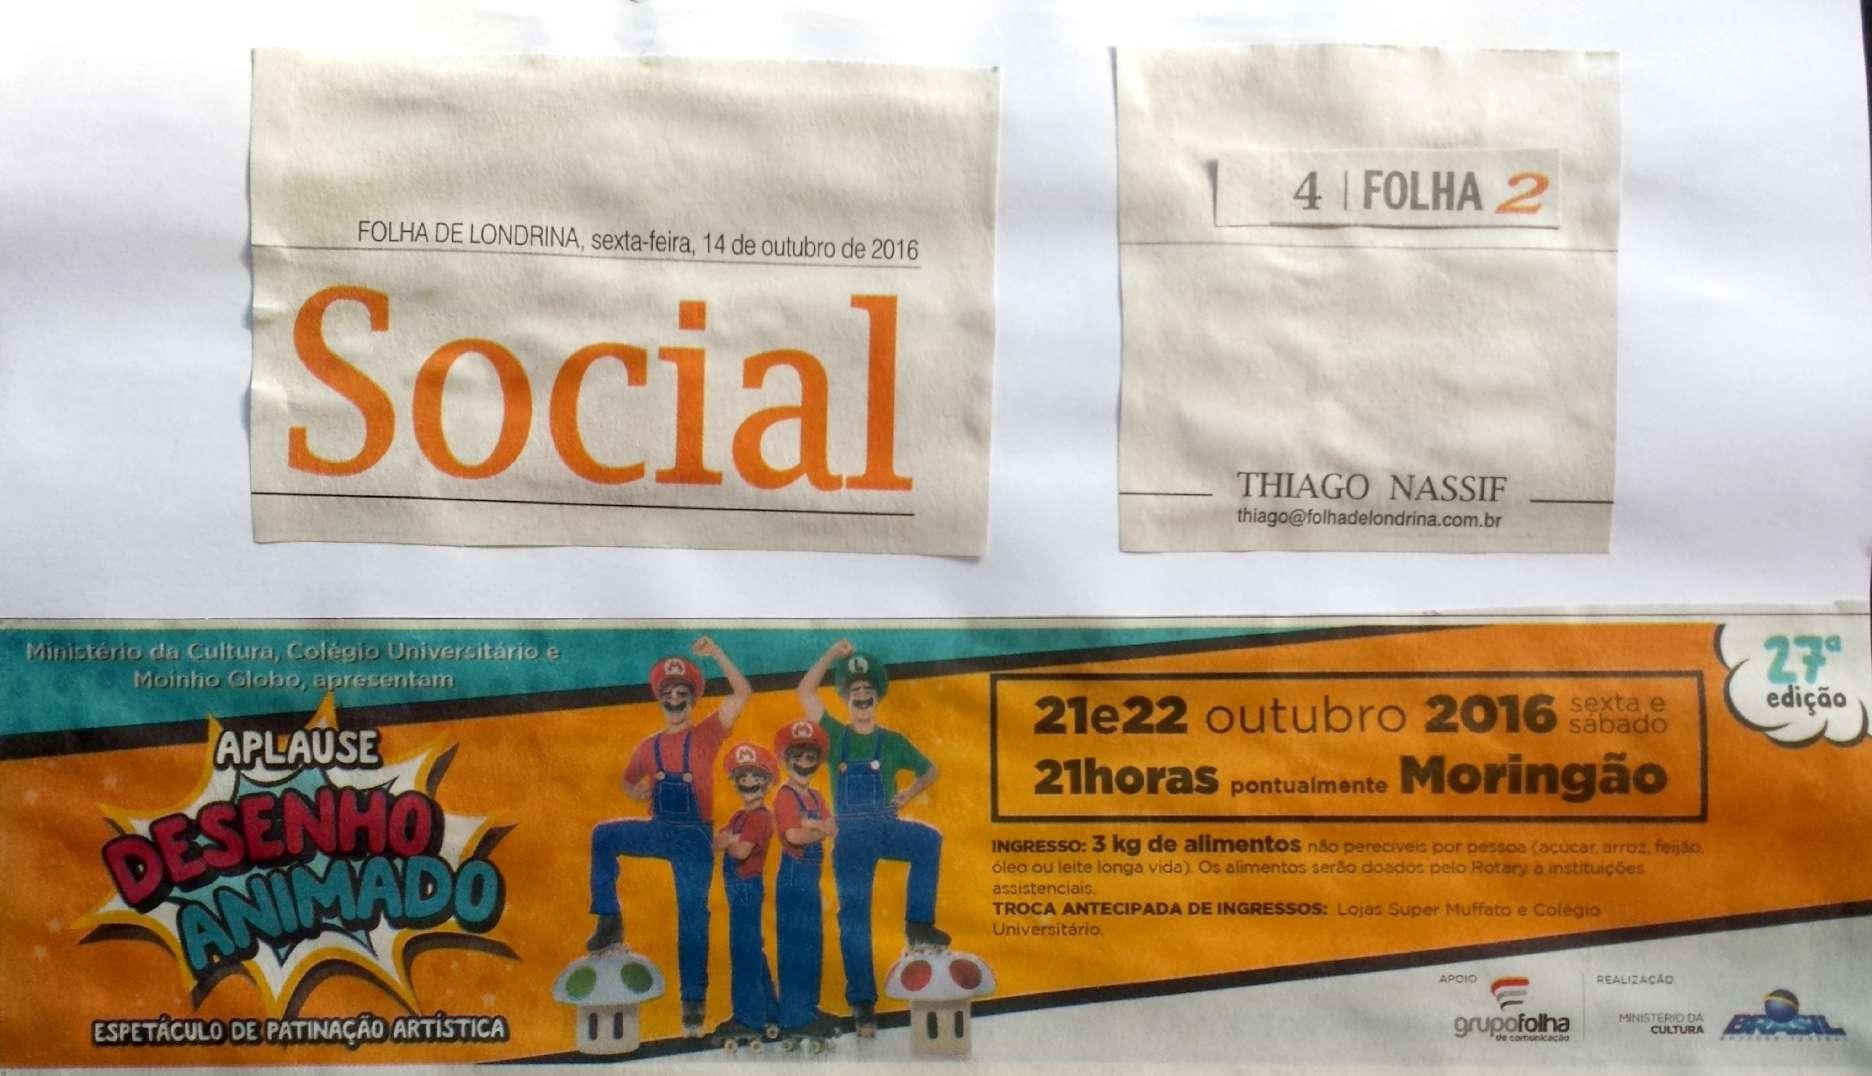 aplause 2016 folha de londrina 14 out